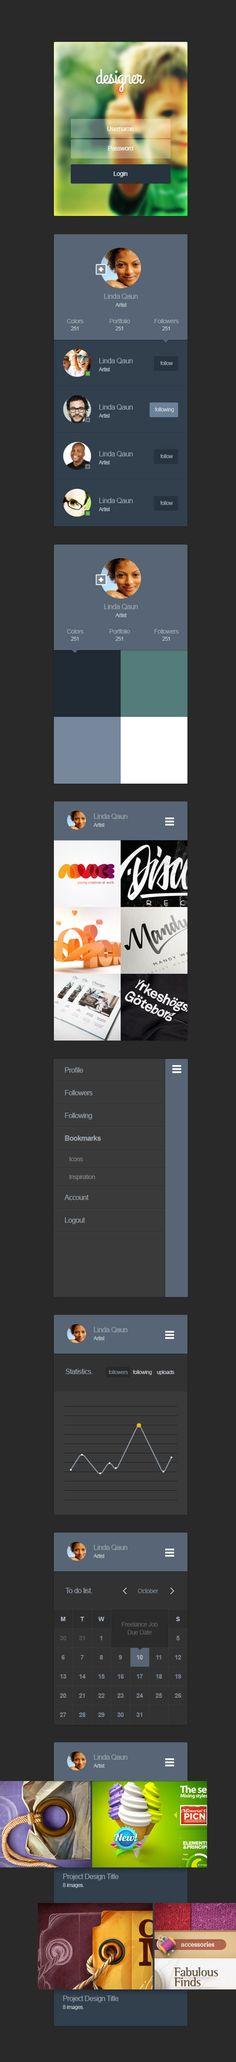 1x1.trans Designer Portfolio App Ui Kit (Psd)